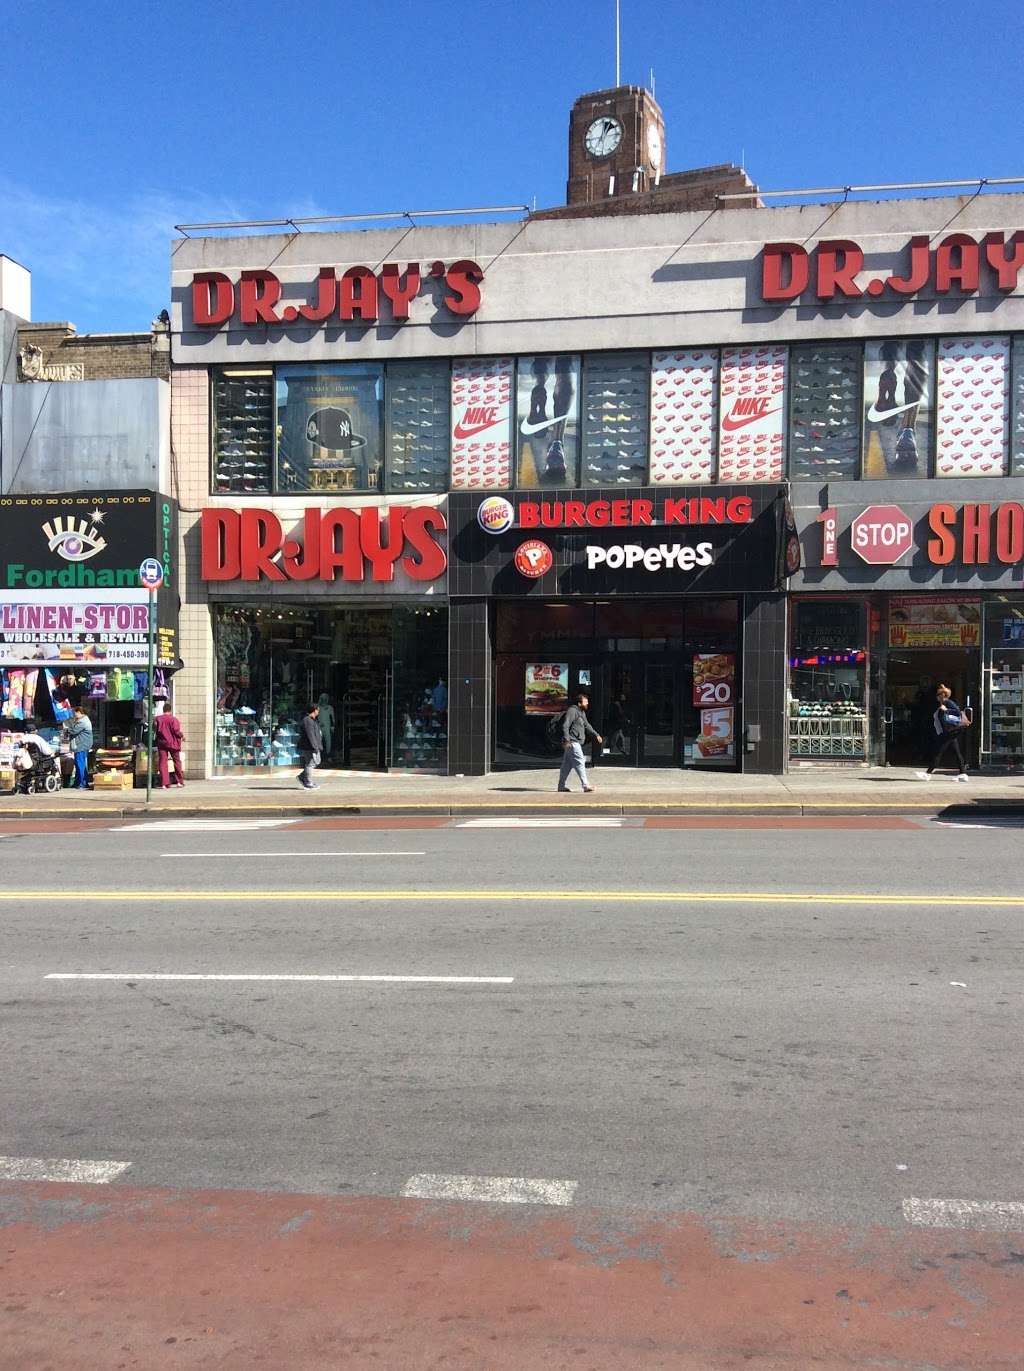 Burger King - restaurant  | Photo 2 of 9 | Address: 213-215 E Fordham Rd, The Bronx, NY 10458, USA | Phone: (347) 344-6815